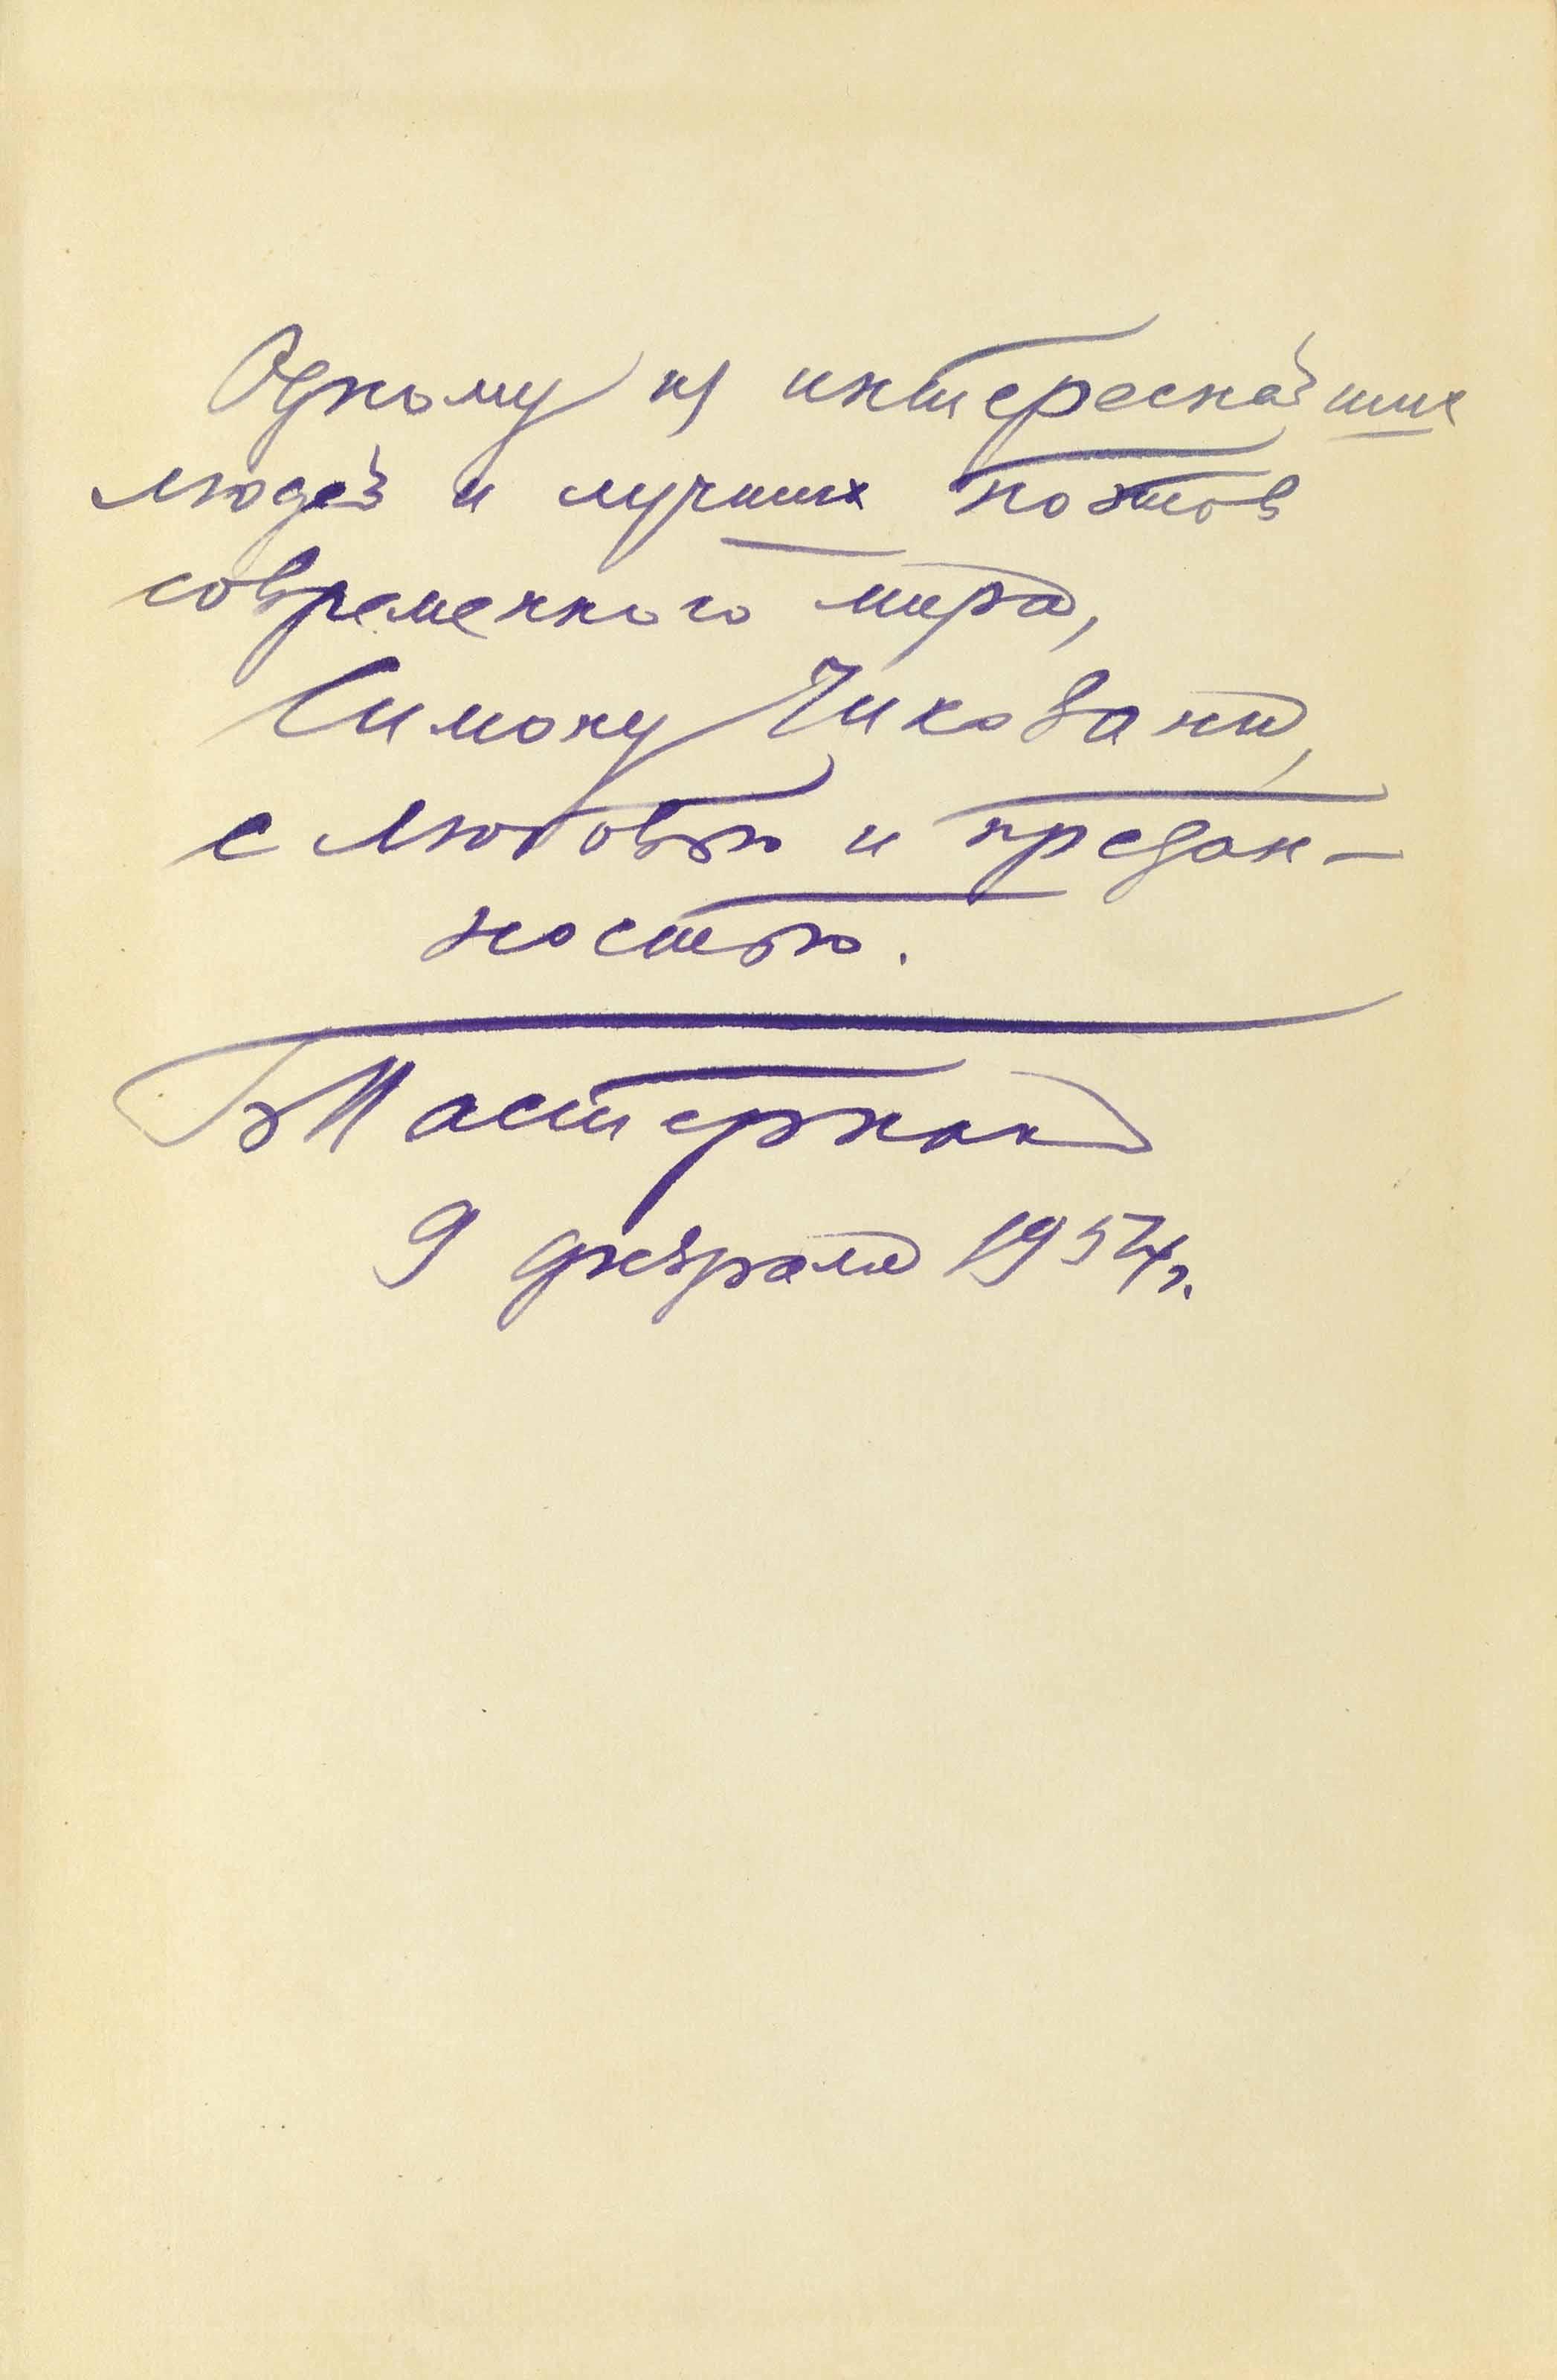 PASTERNAK, Boris (1890-1960) –